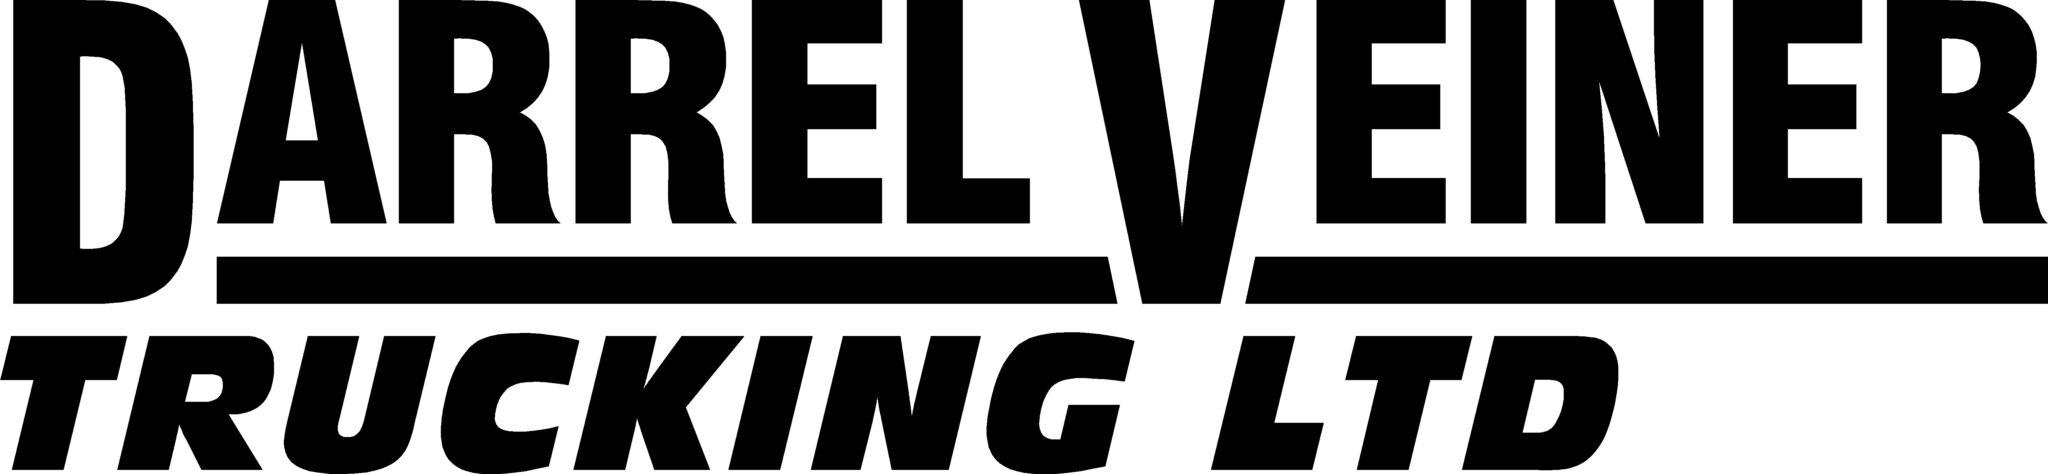 Darrel Veiner Trucking Ltd.